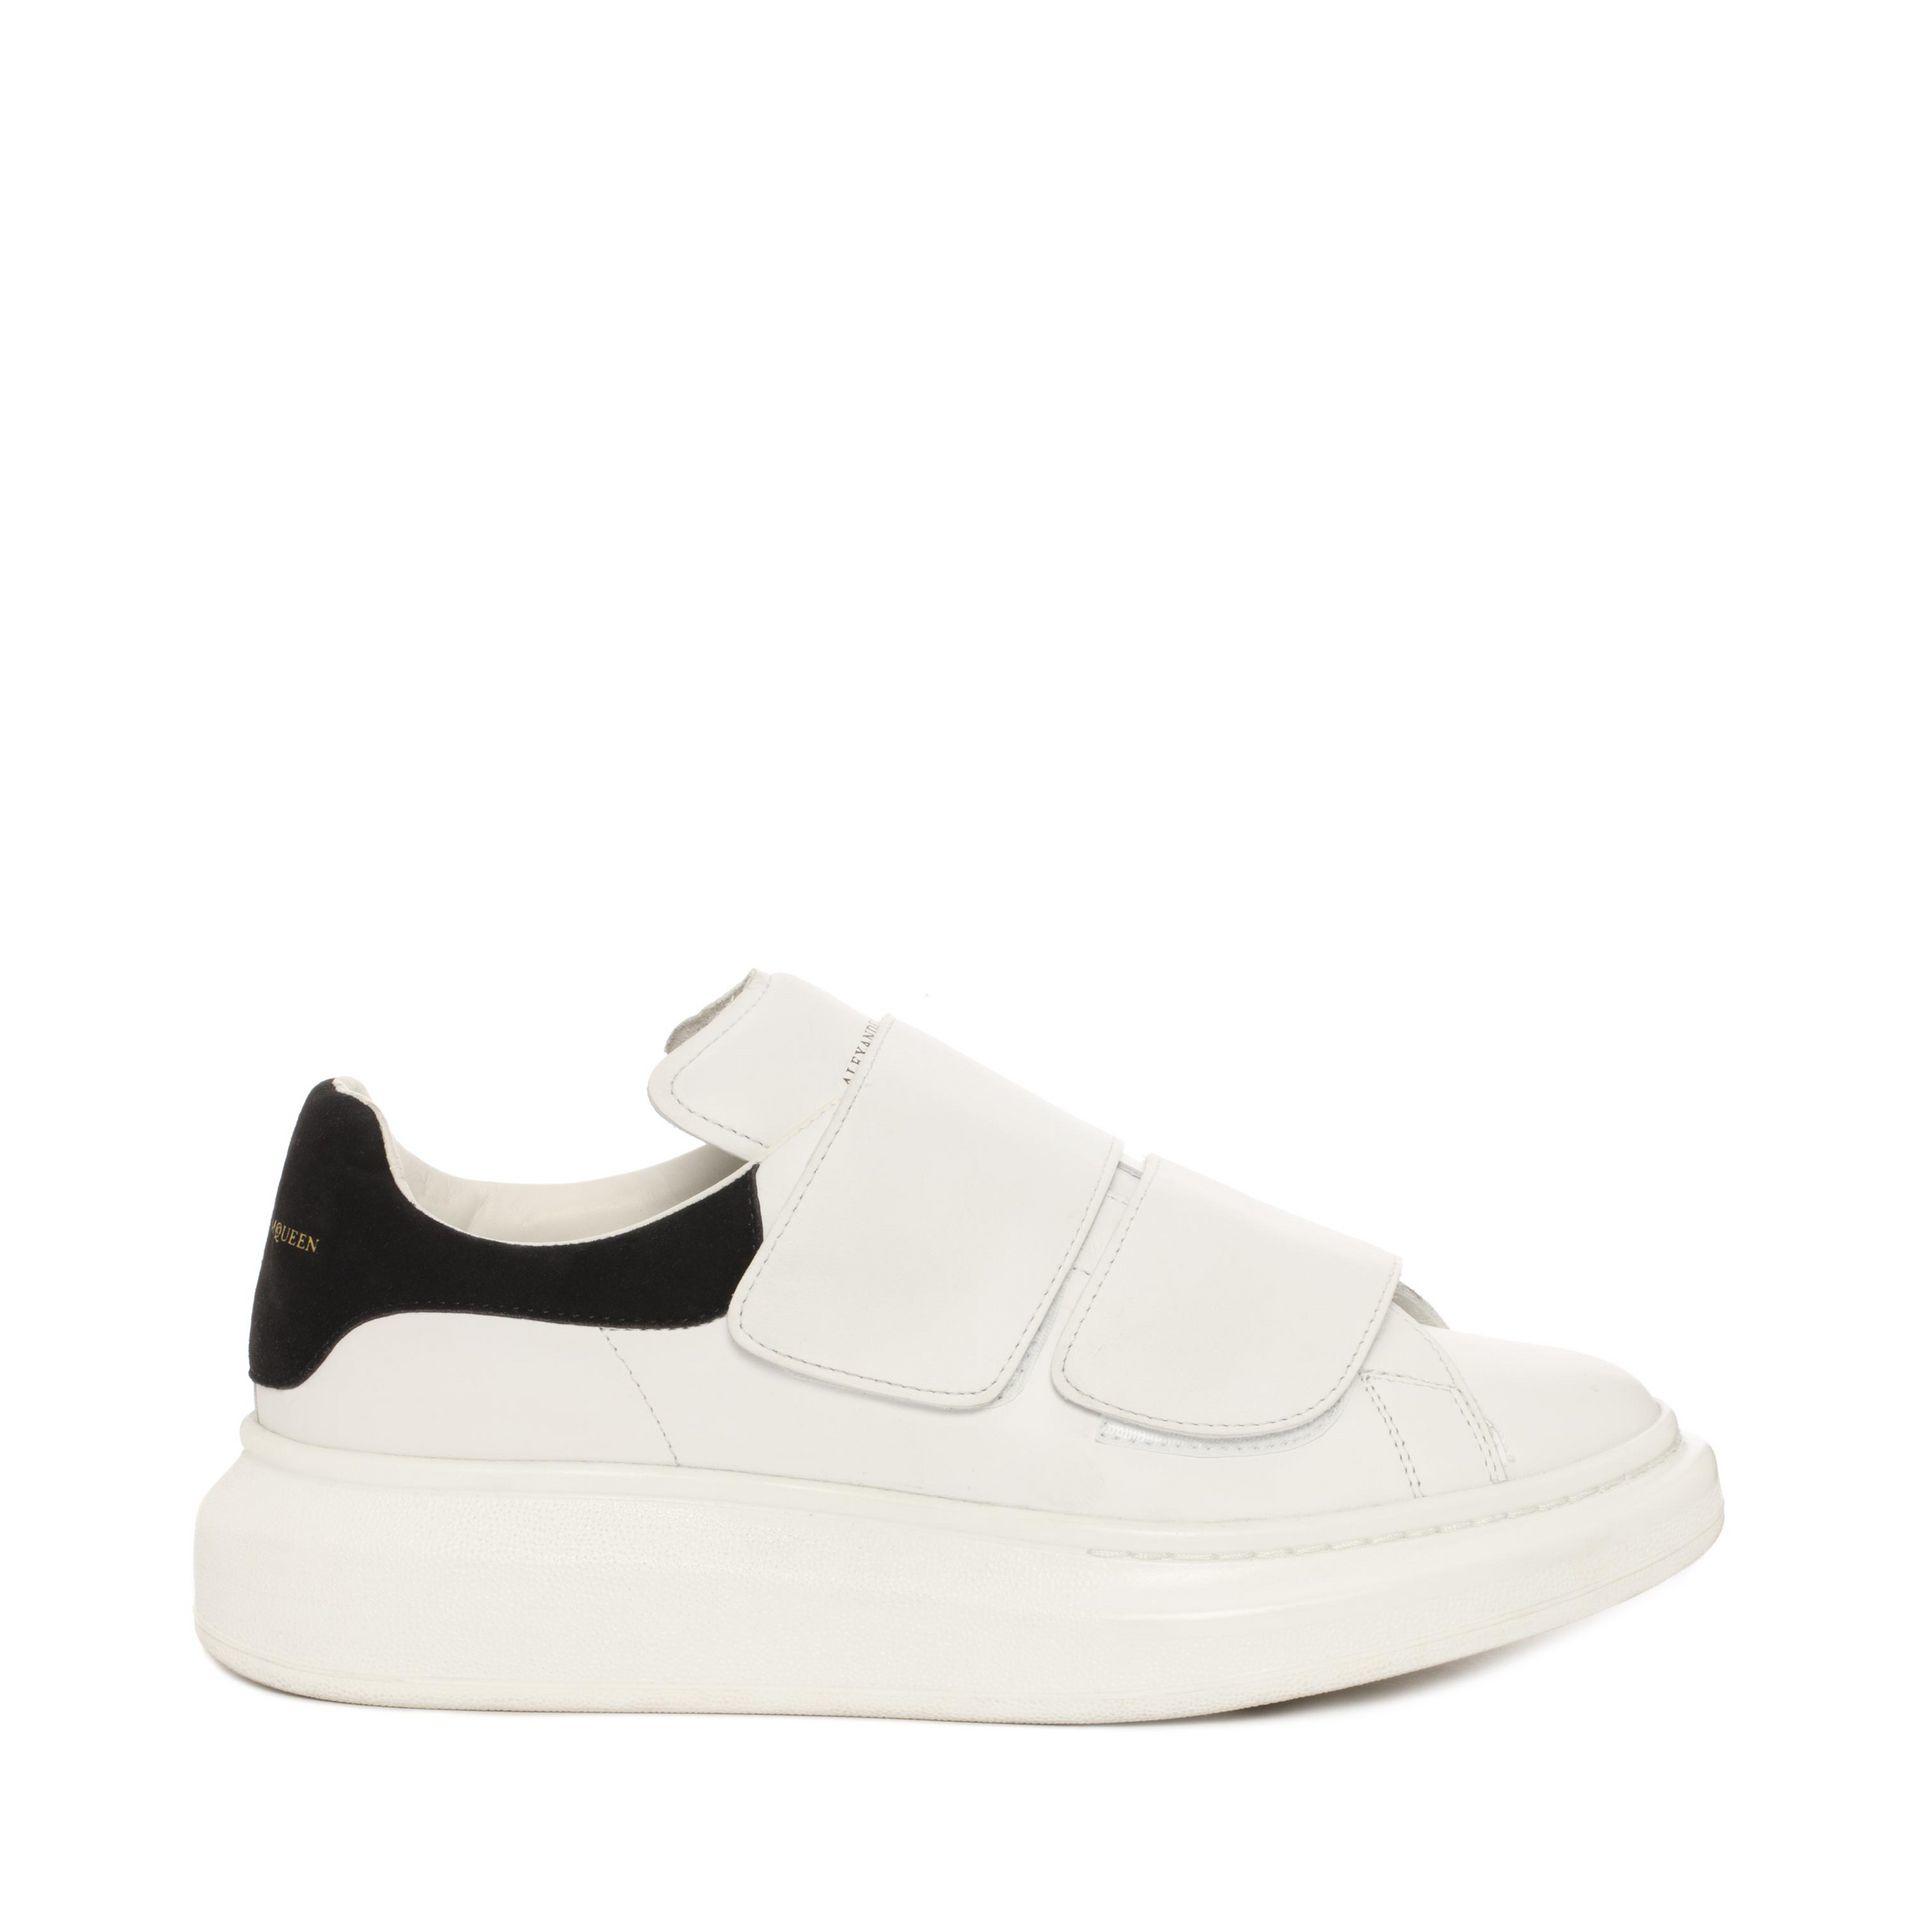 a752b7c7bca6 Lyst - Alexander McQueen Velcro Strap Oversized Sneaker in White